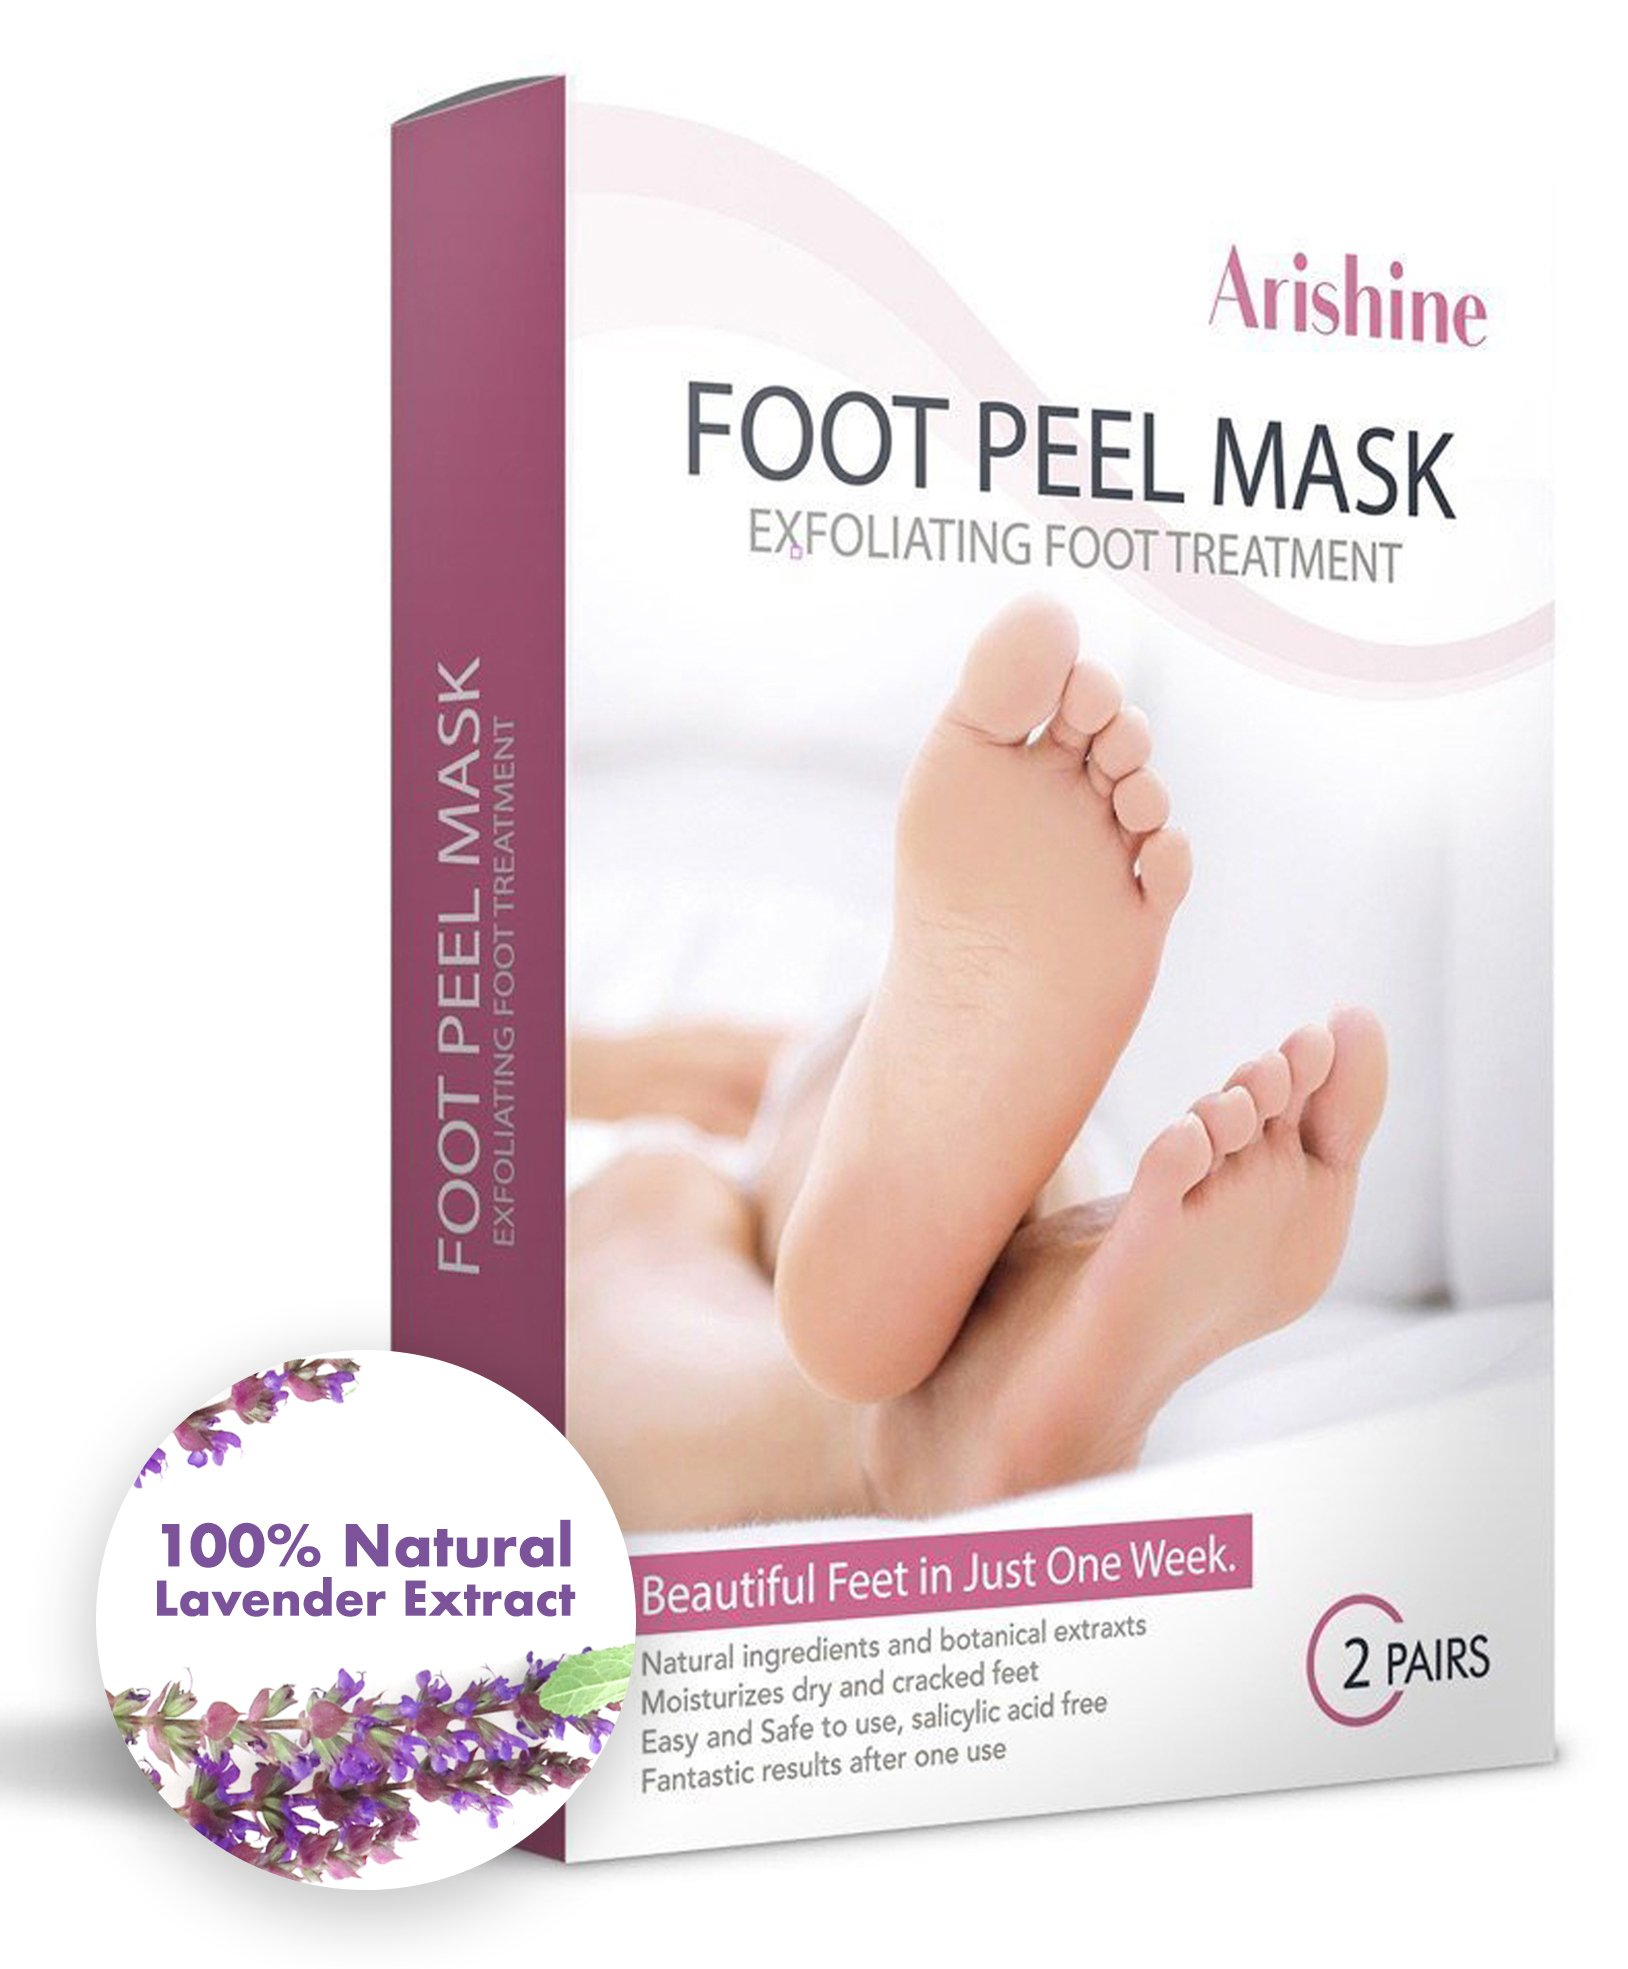 Foot Peel Mask, Exfoliating Peels Away Calluses and Dead Skin - Get Soft Baby Foot Naturally in 1-2 Weeks, Lavender (2 Pairs)